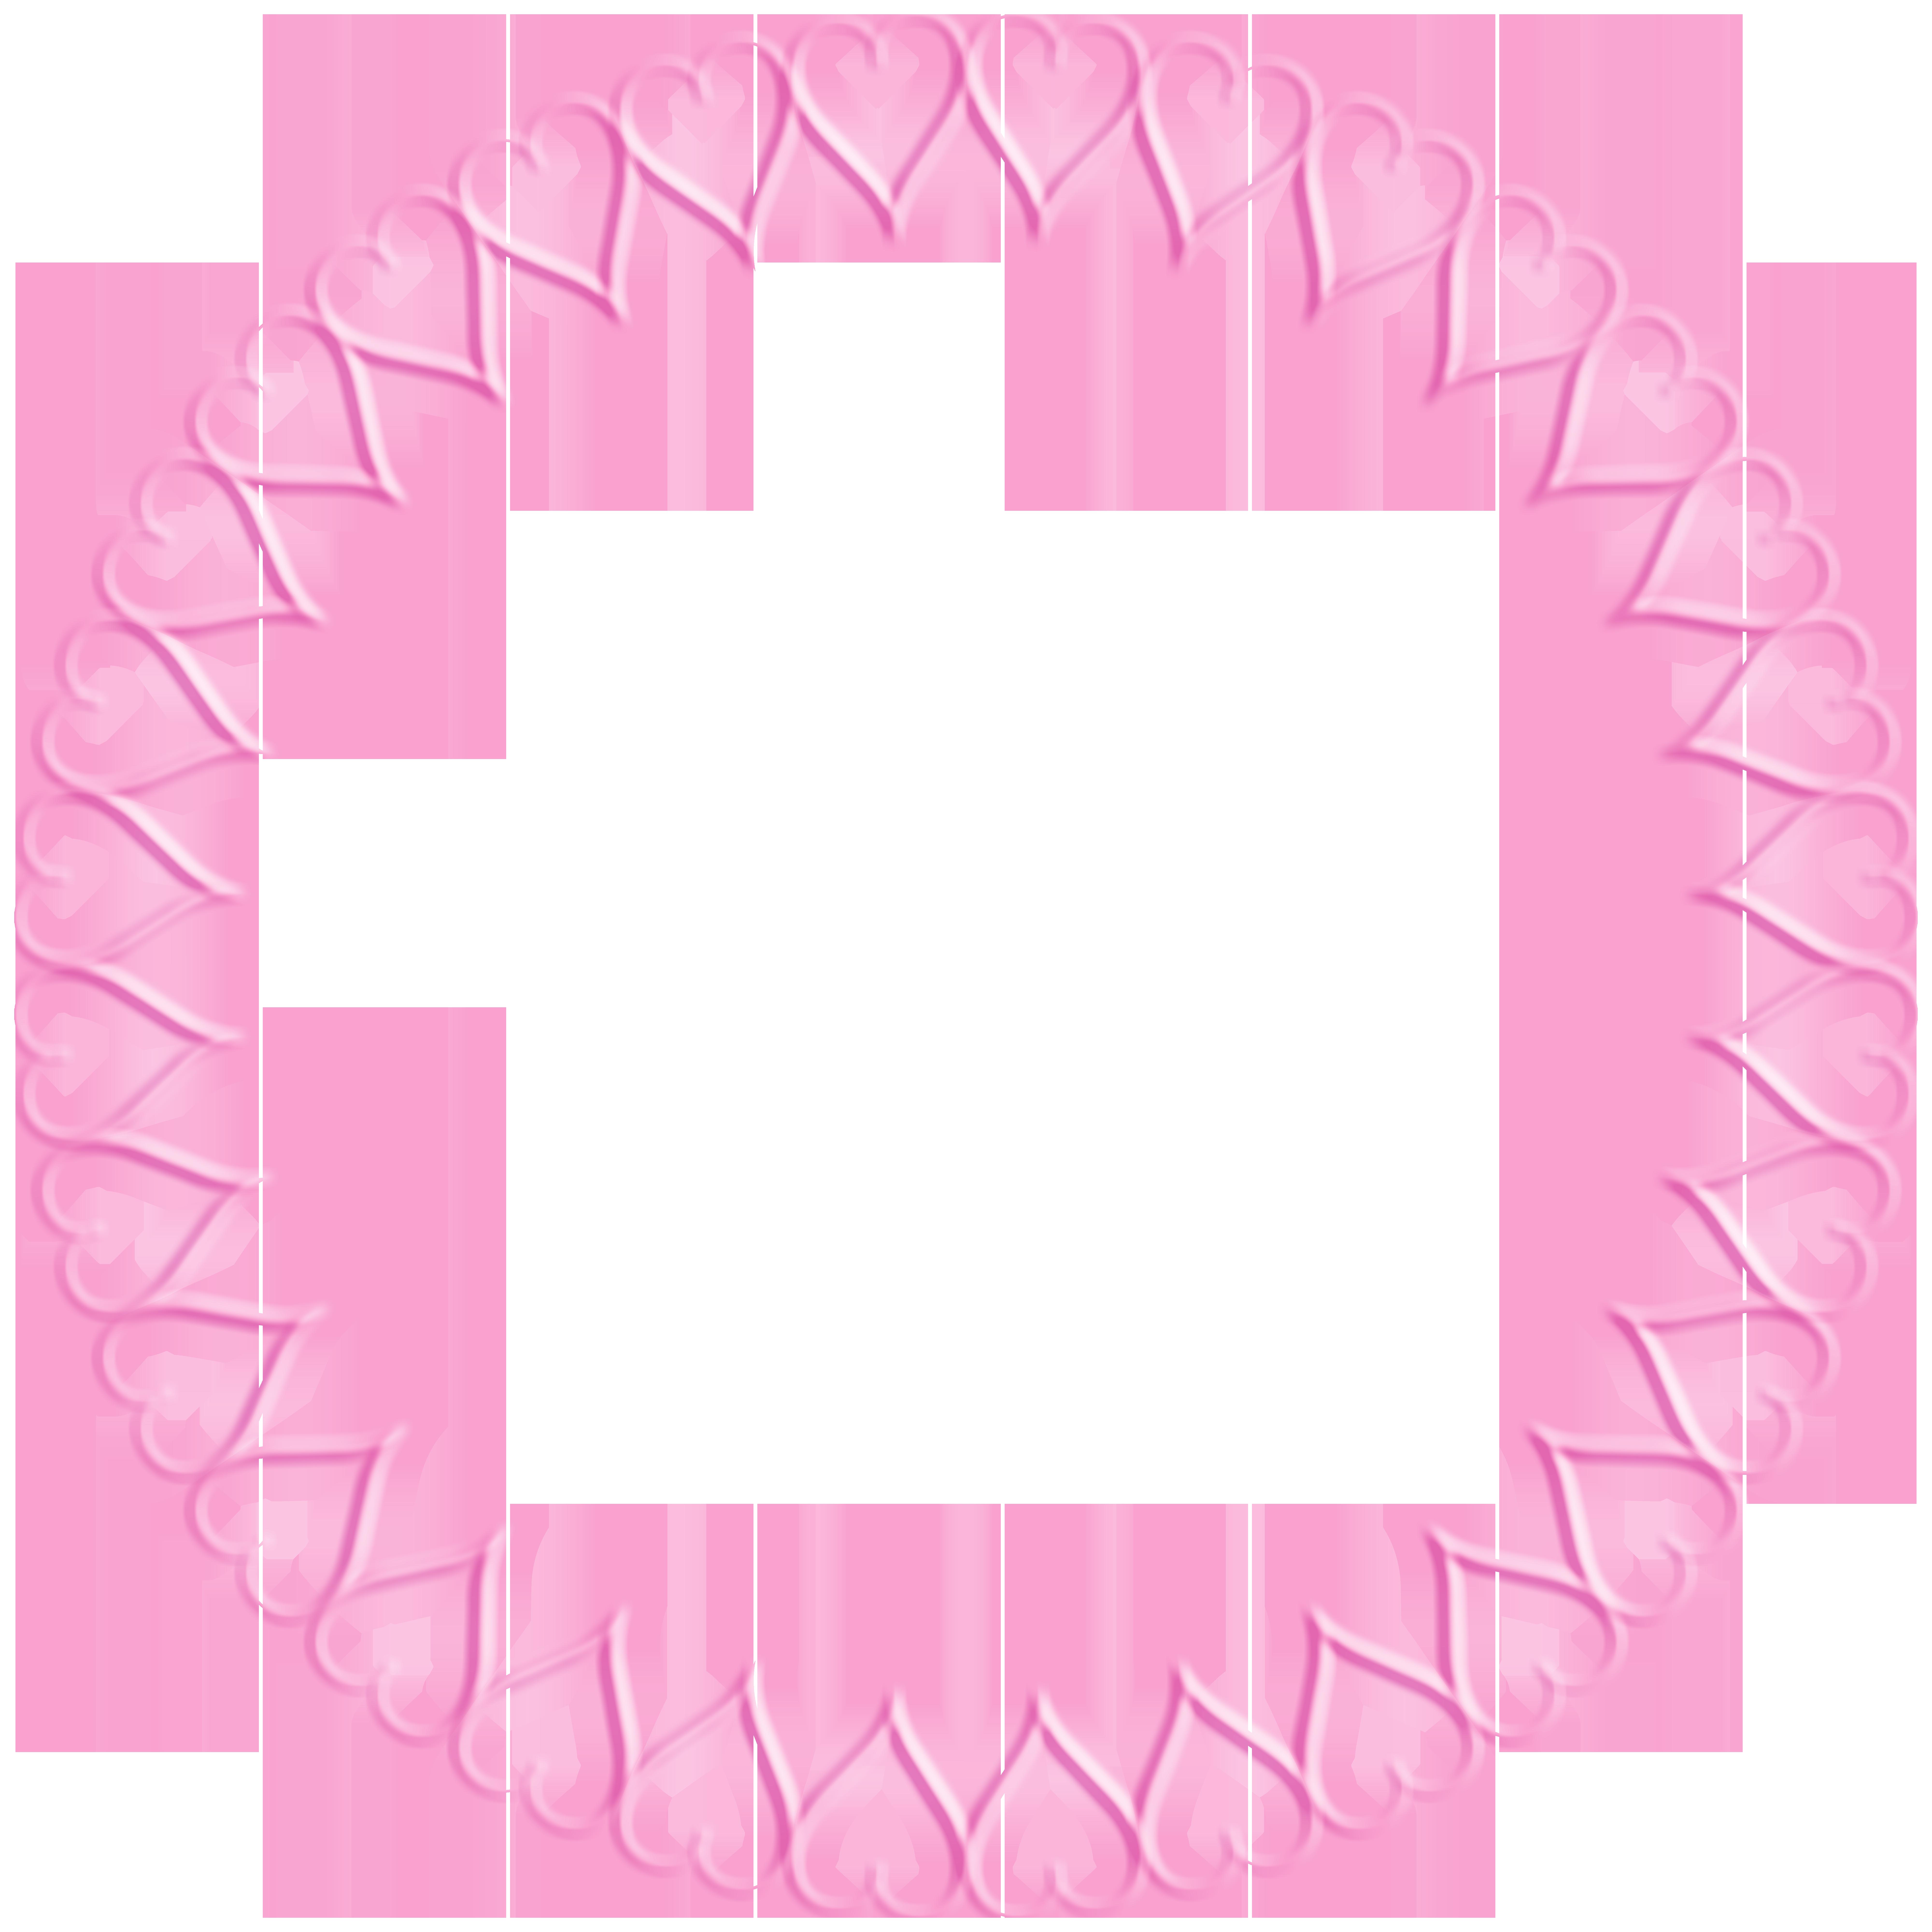 Pink heart border clipart jpg freeuse Pink Round Heart Border Transparent Clip Art Image | Gallery ... jpg freeuse